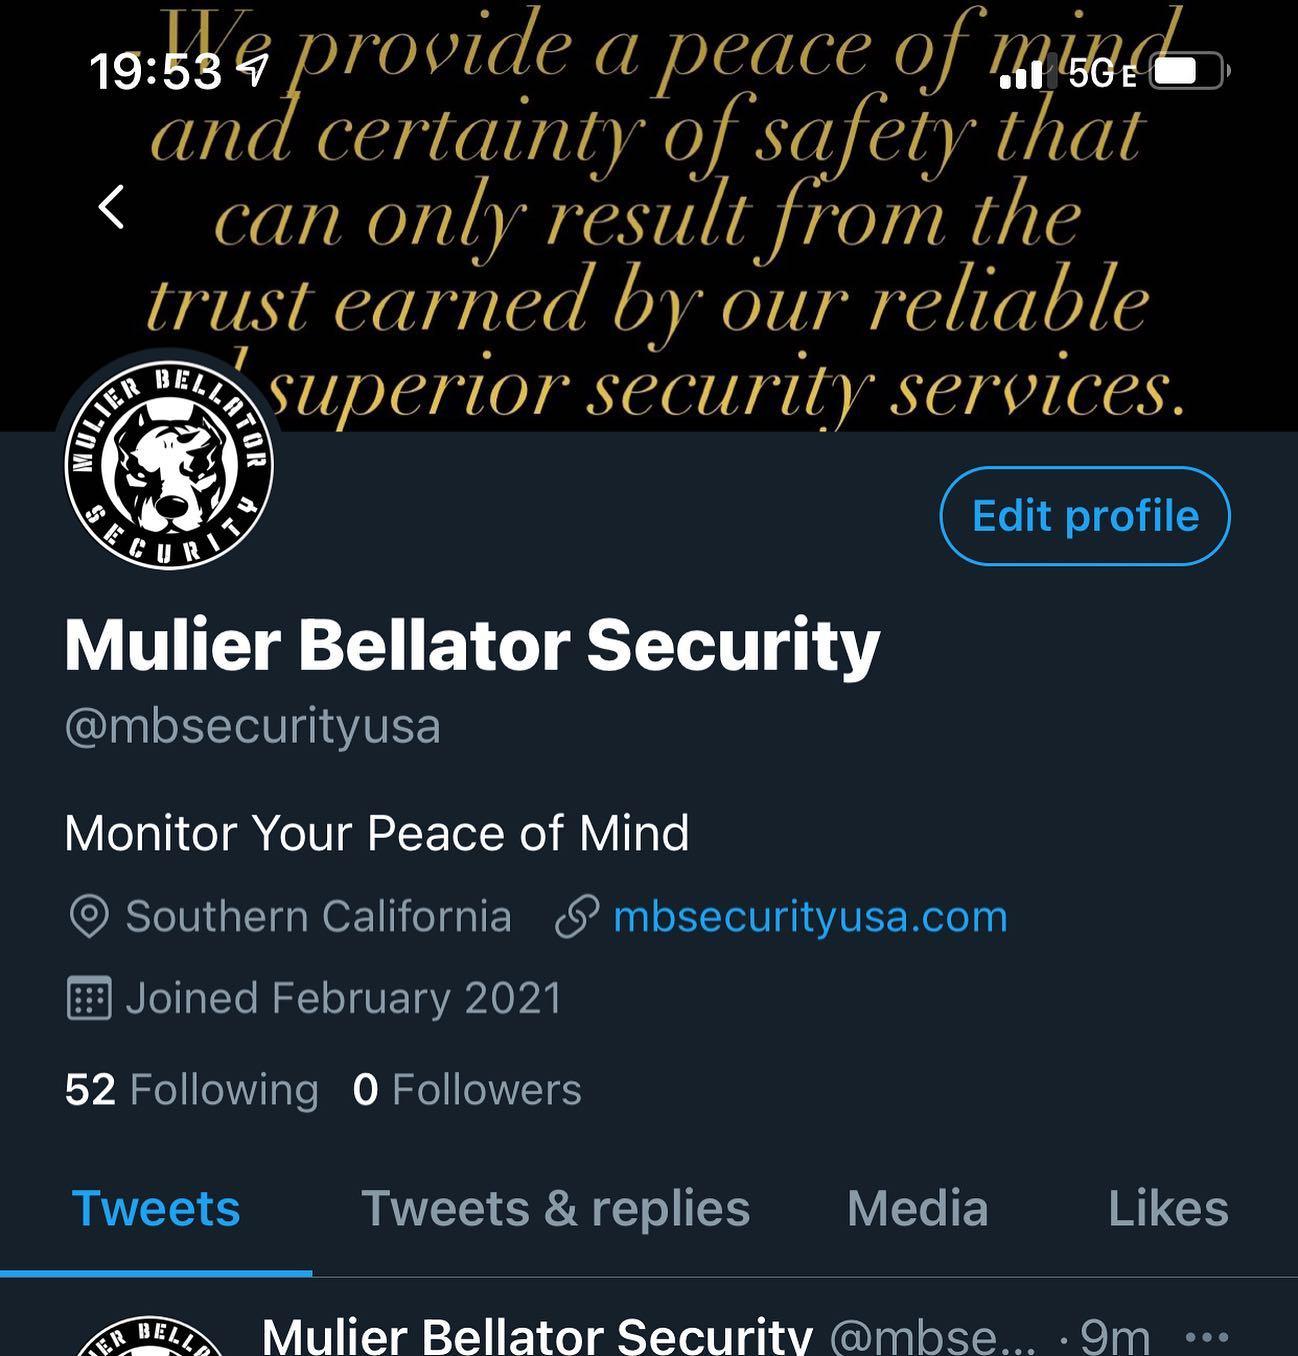 Mulier Bellator Security